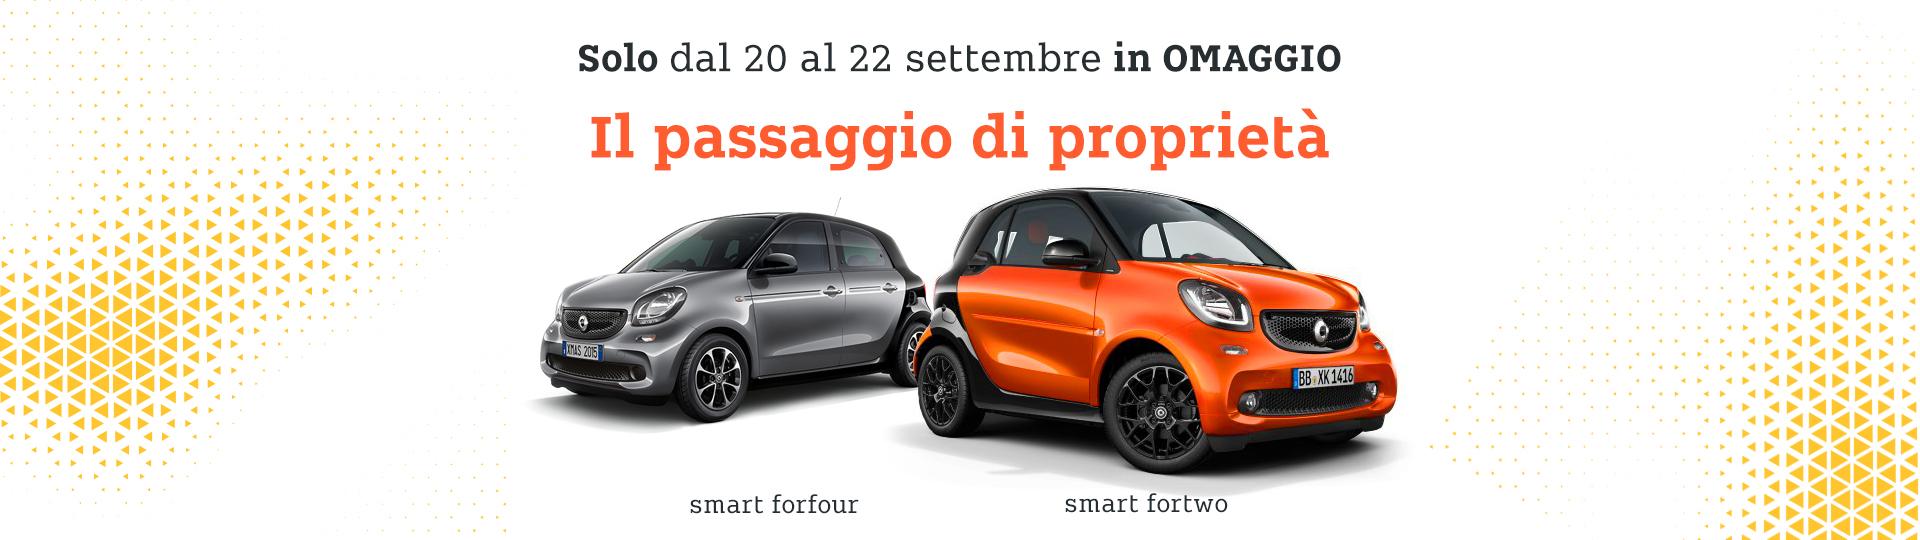 header_smart_km0_promo_settembre_2019_00.jpg